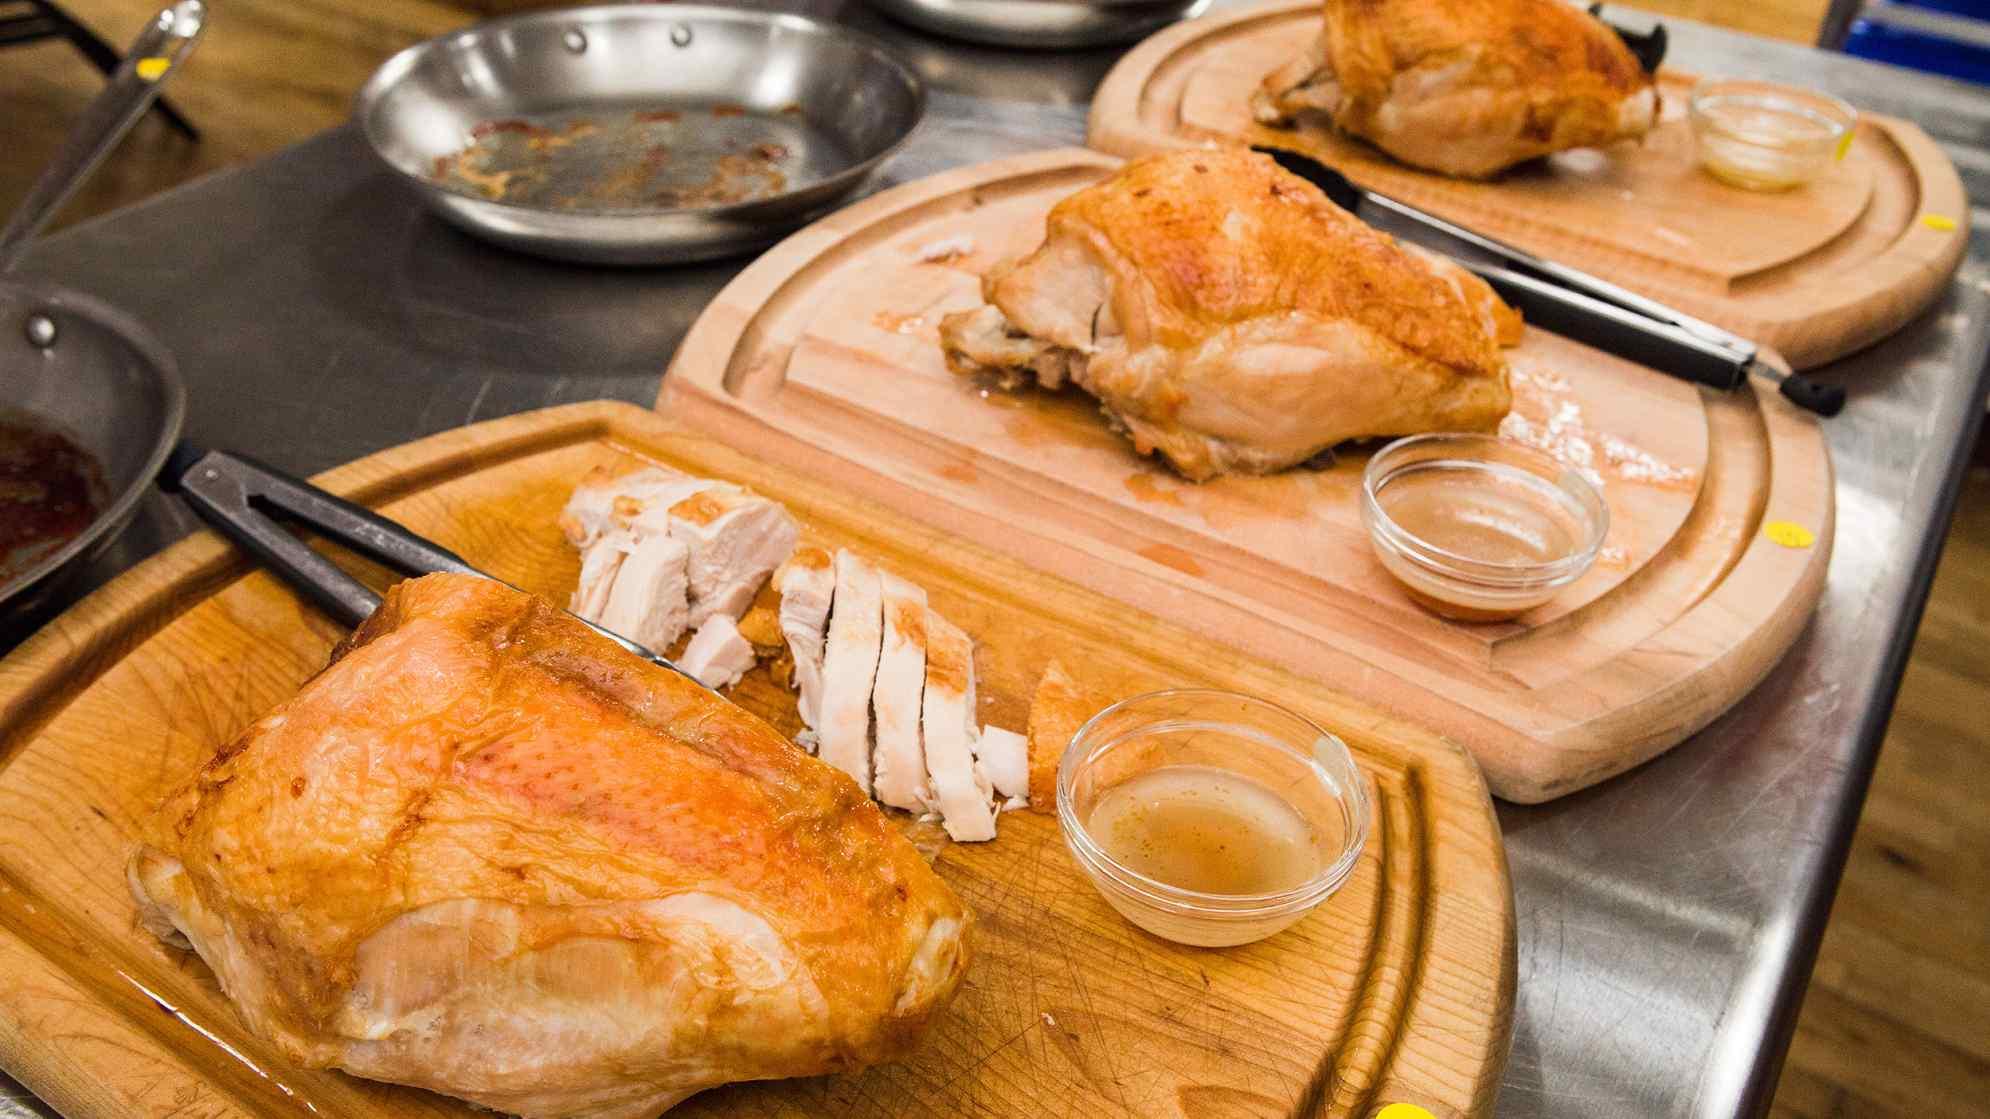 Roast Turkey Breast With Gravy